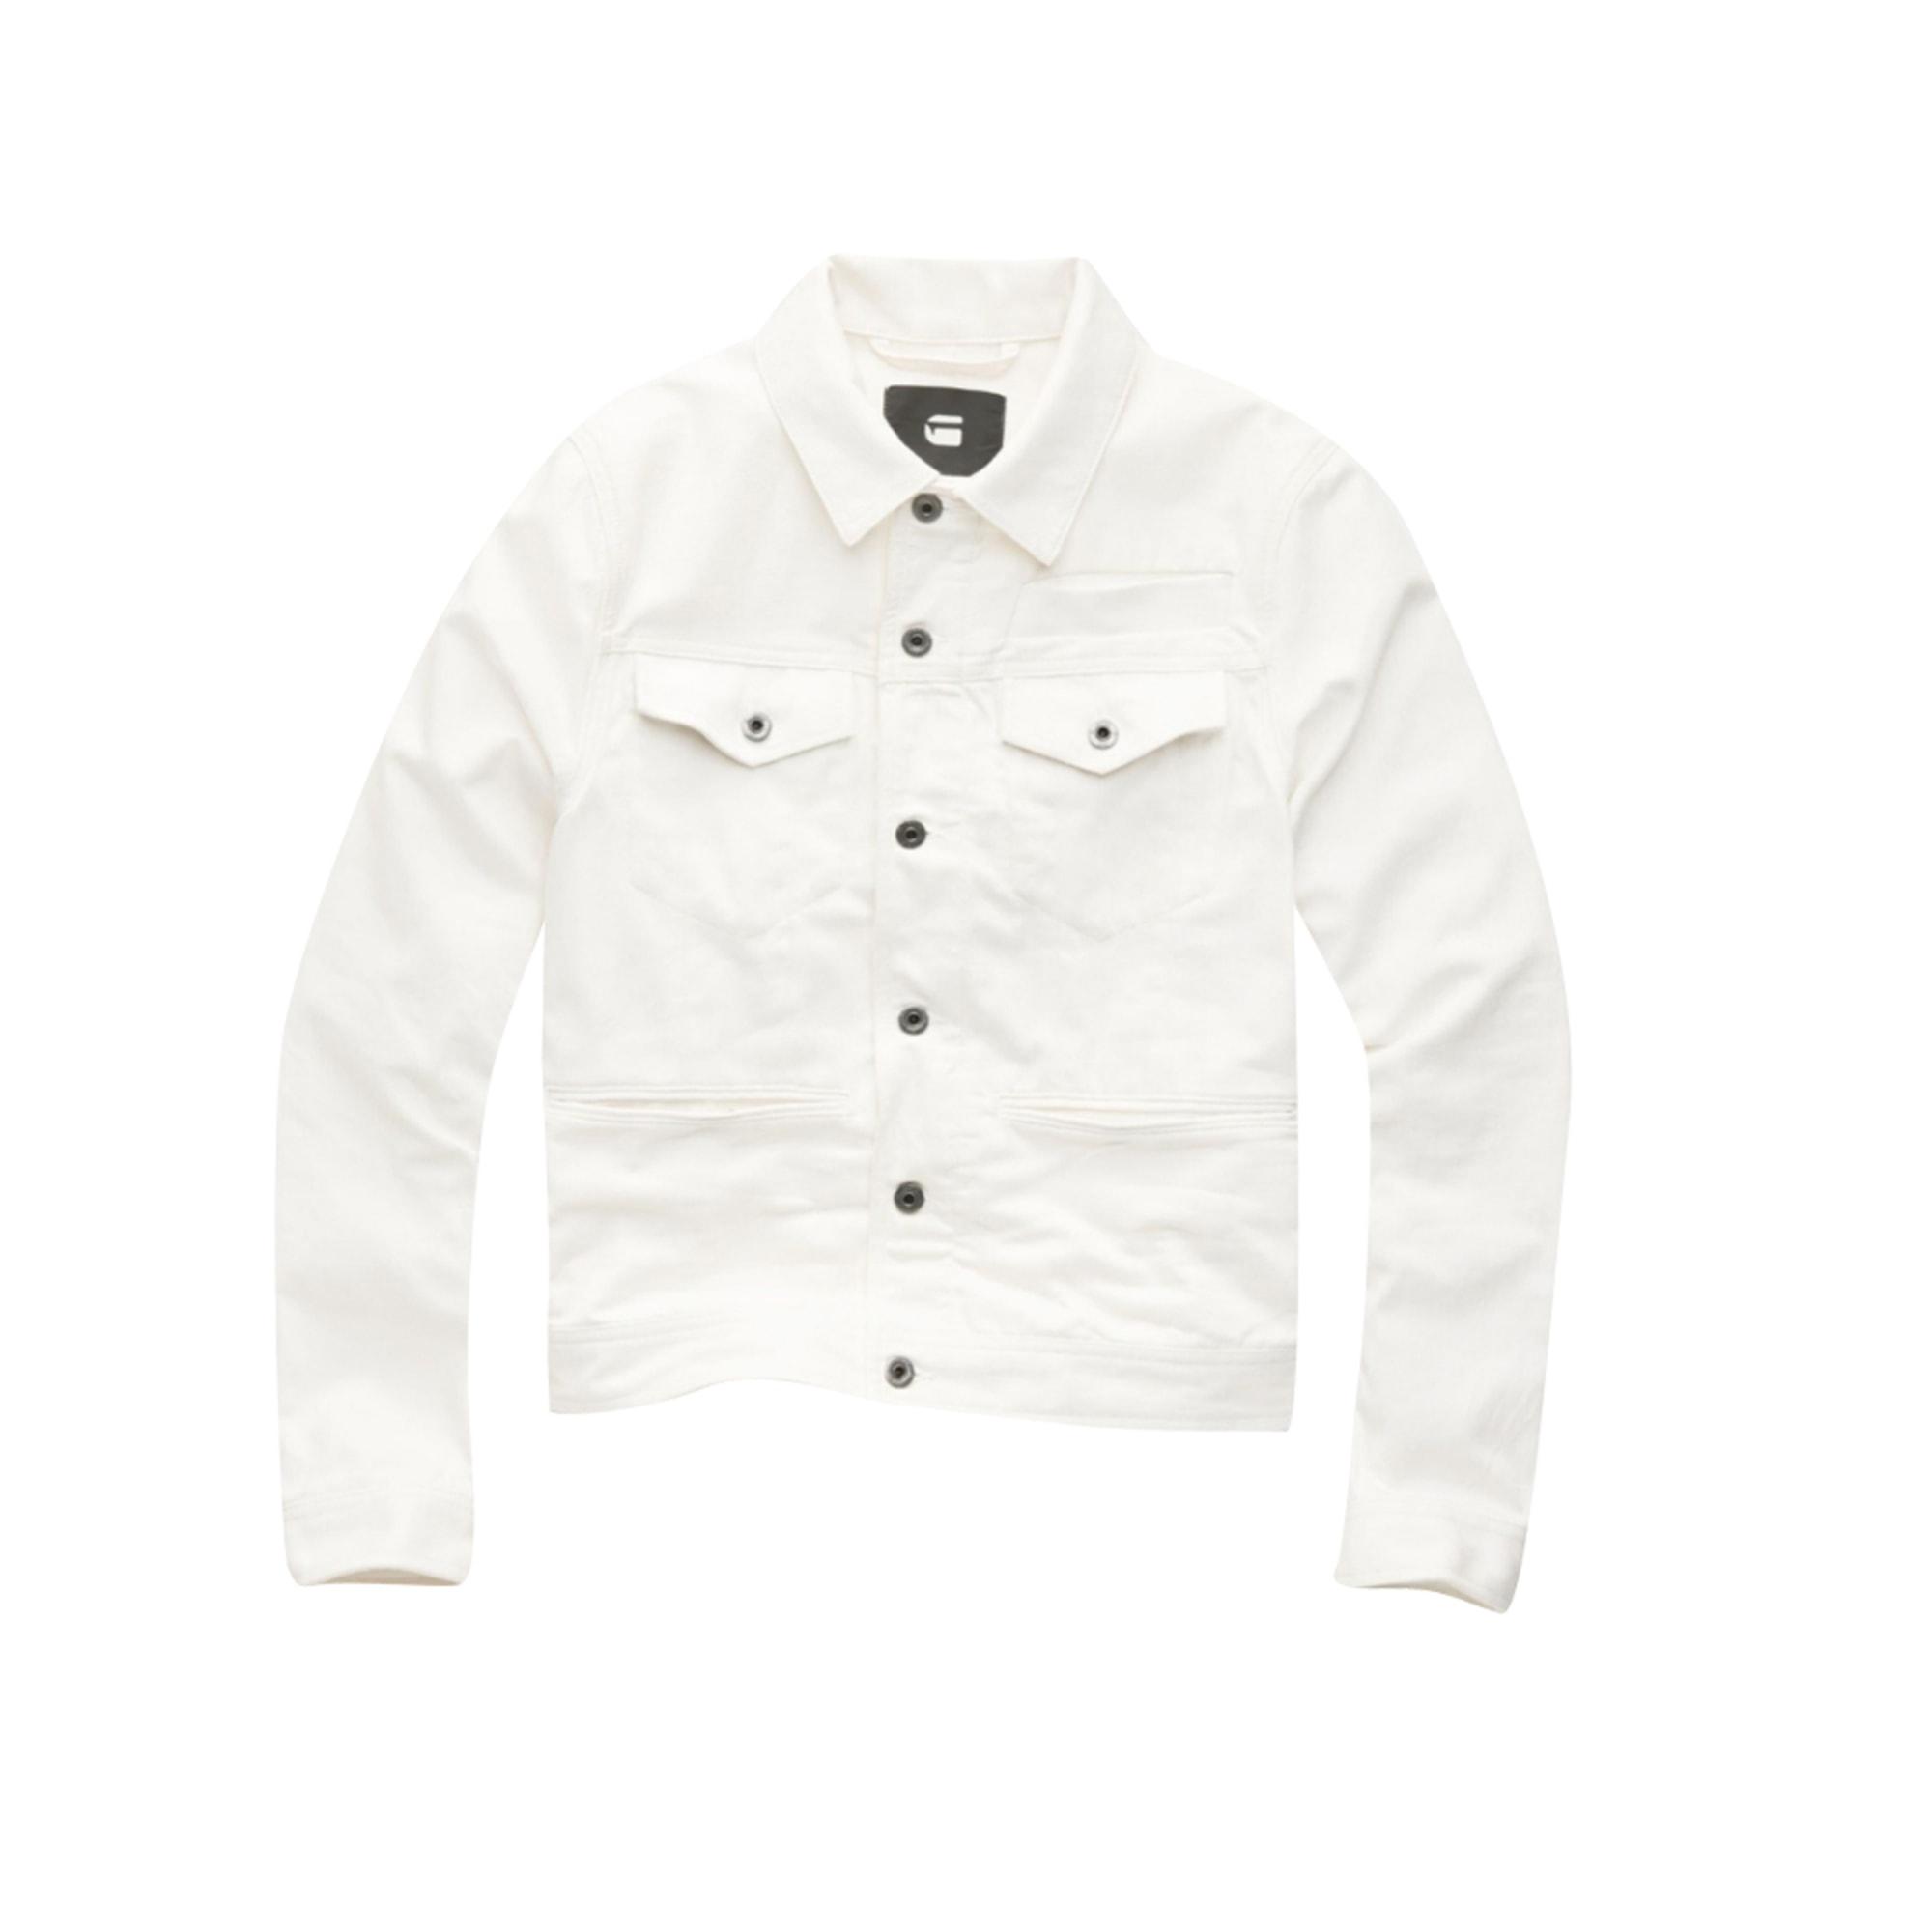 Veste G-STAR Blanc, blanc cassé, écru